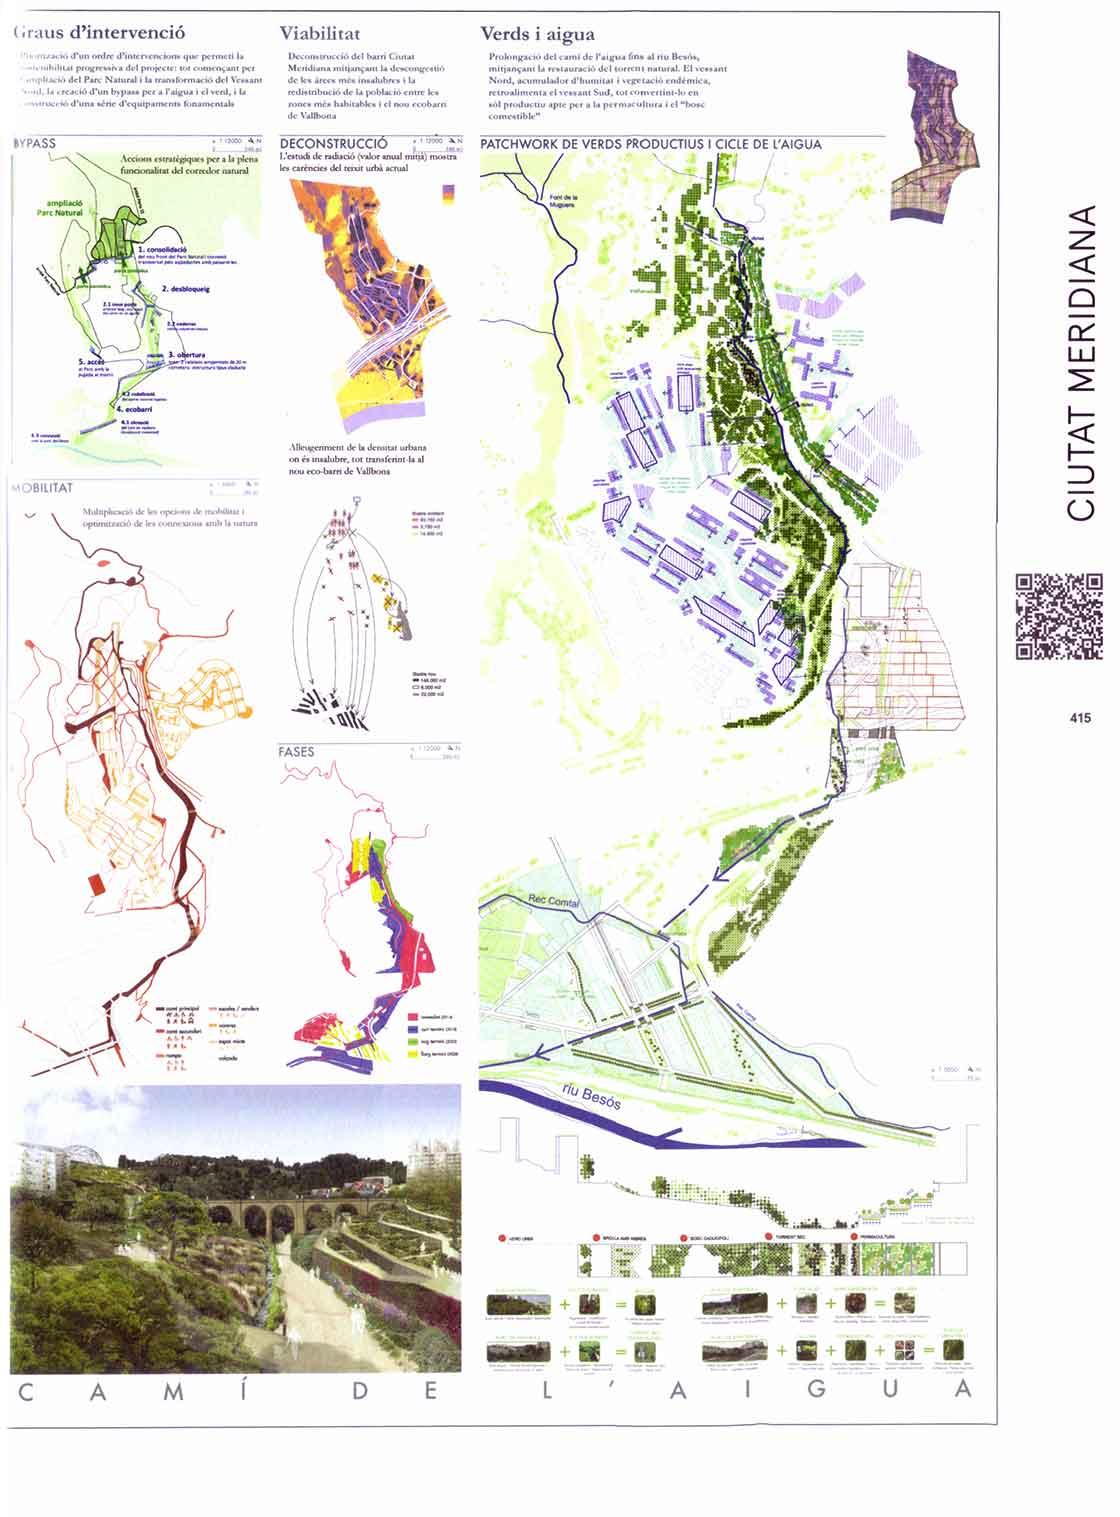 Naturbà - página 415 @Marc García-Durán, arquitecto